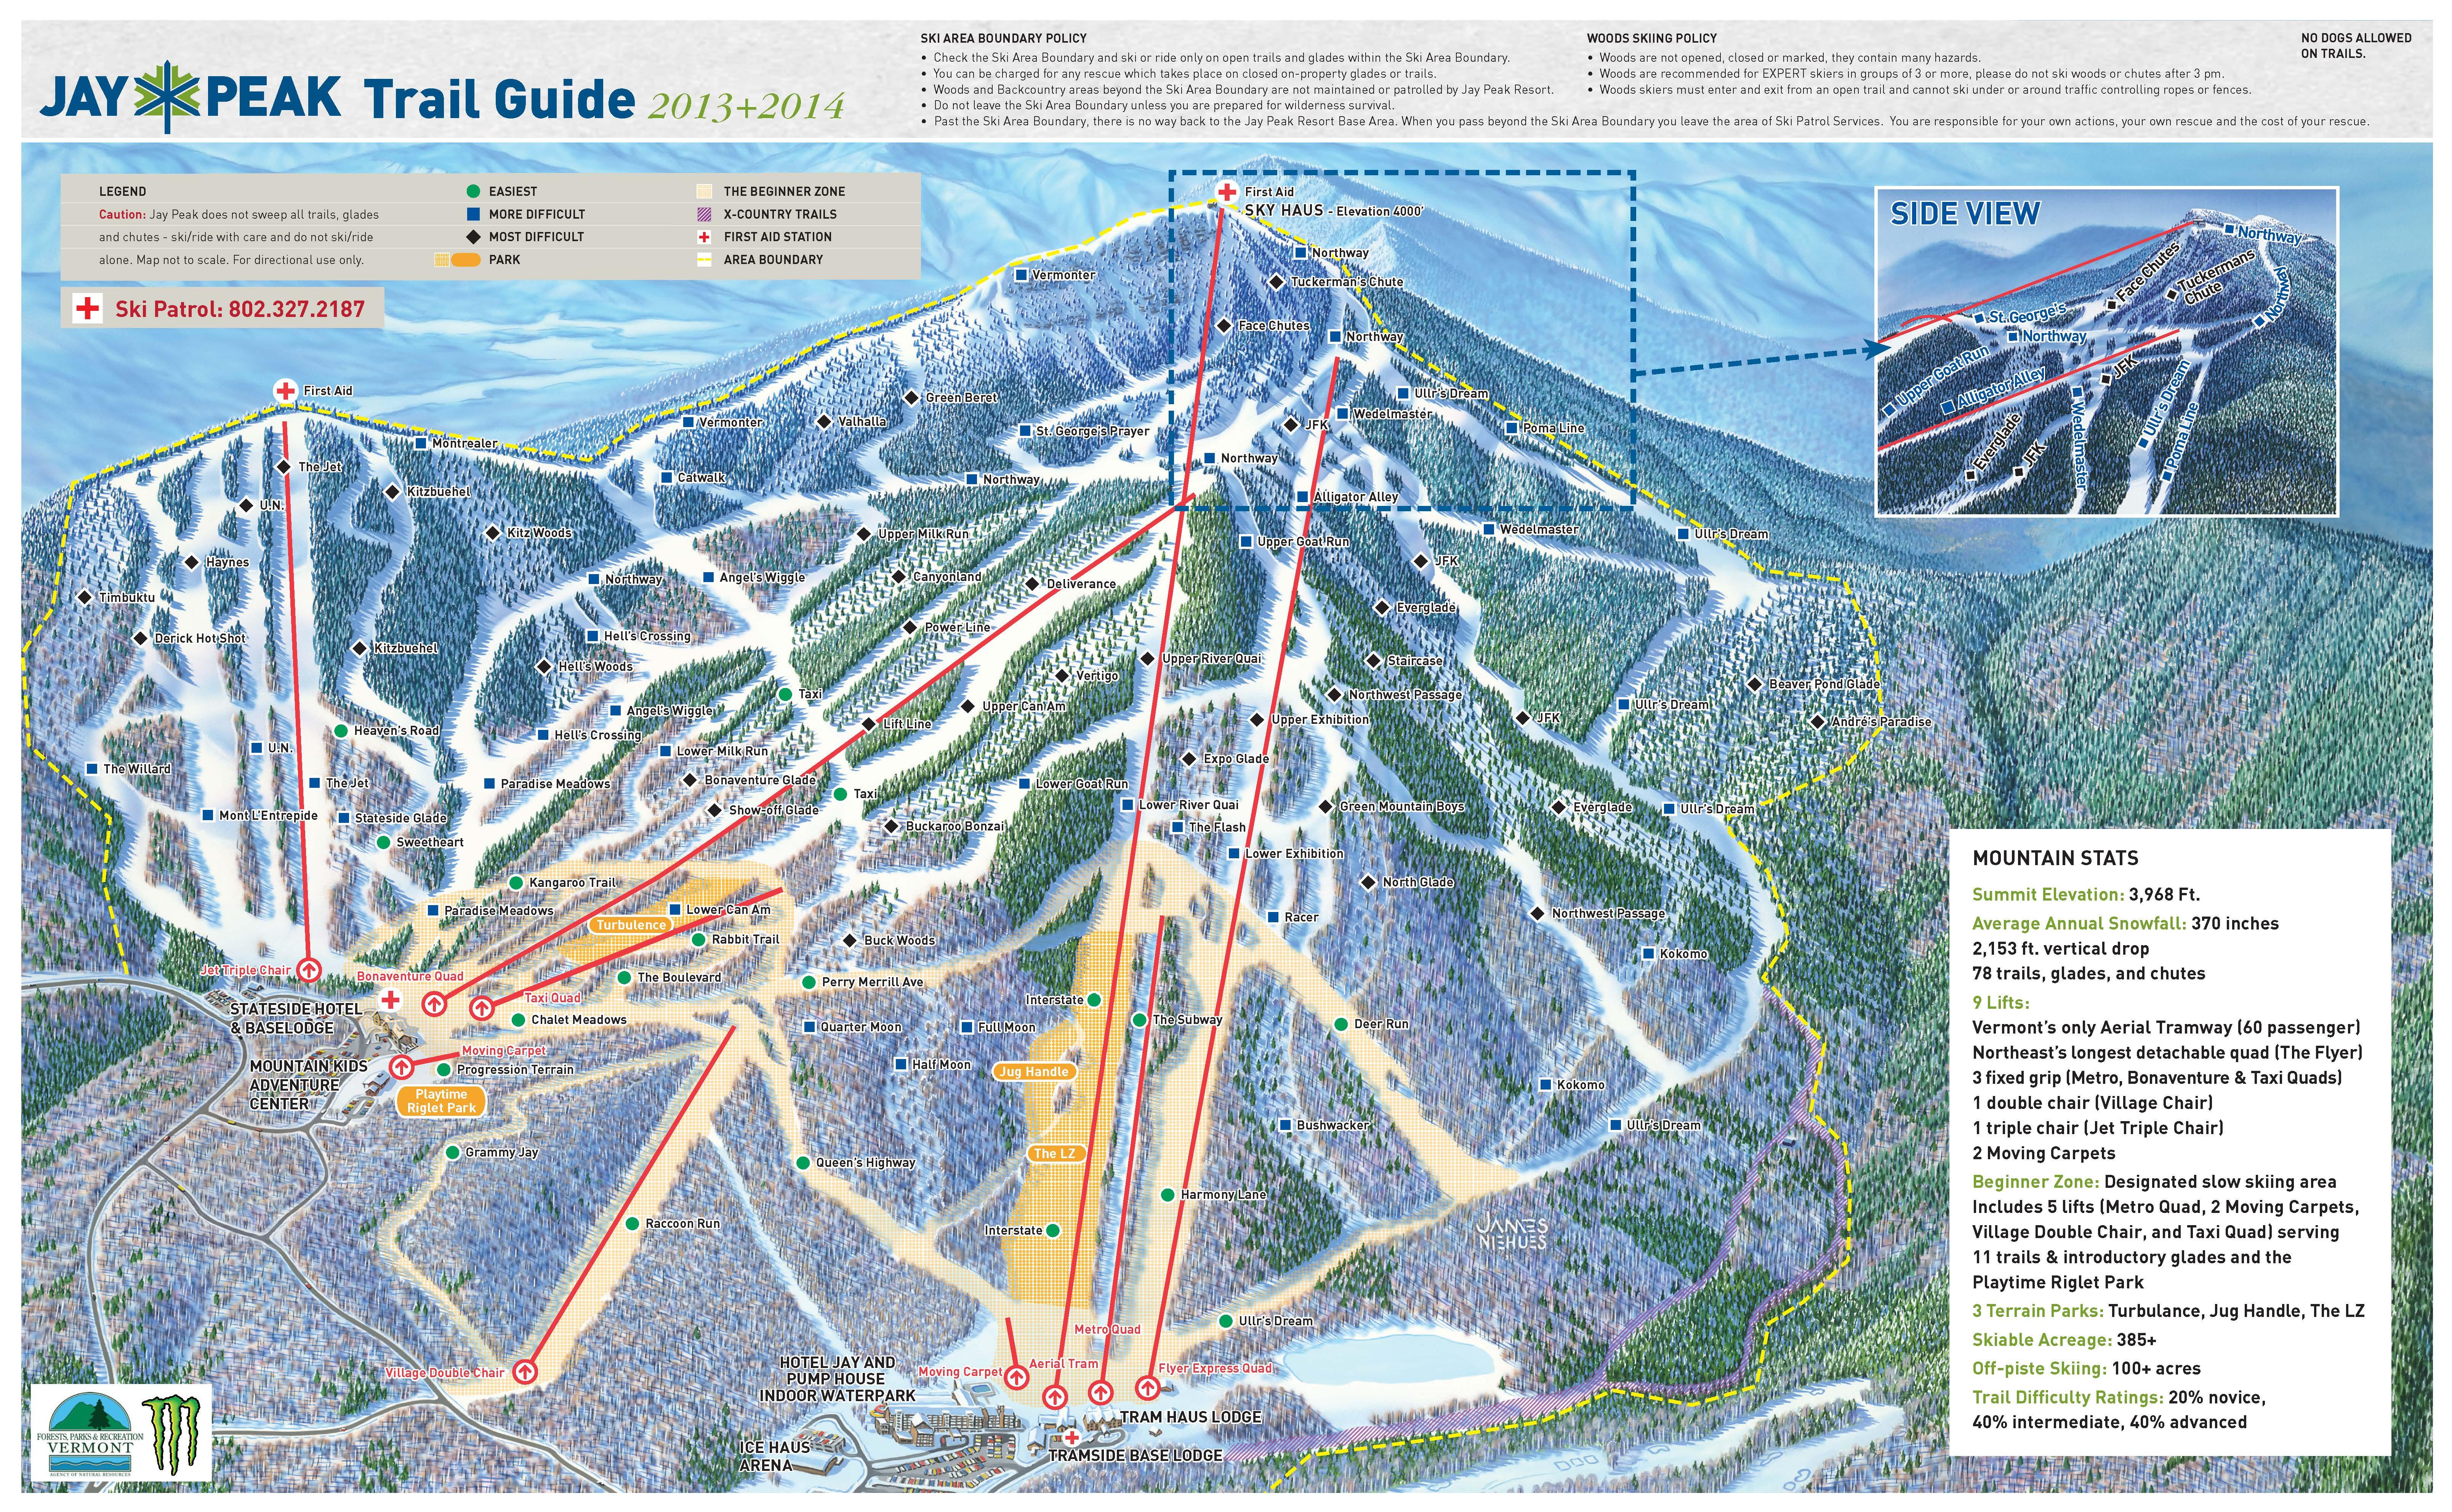 skiing & snowboarding - phineas swann bed and breakfast inn